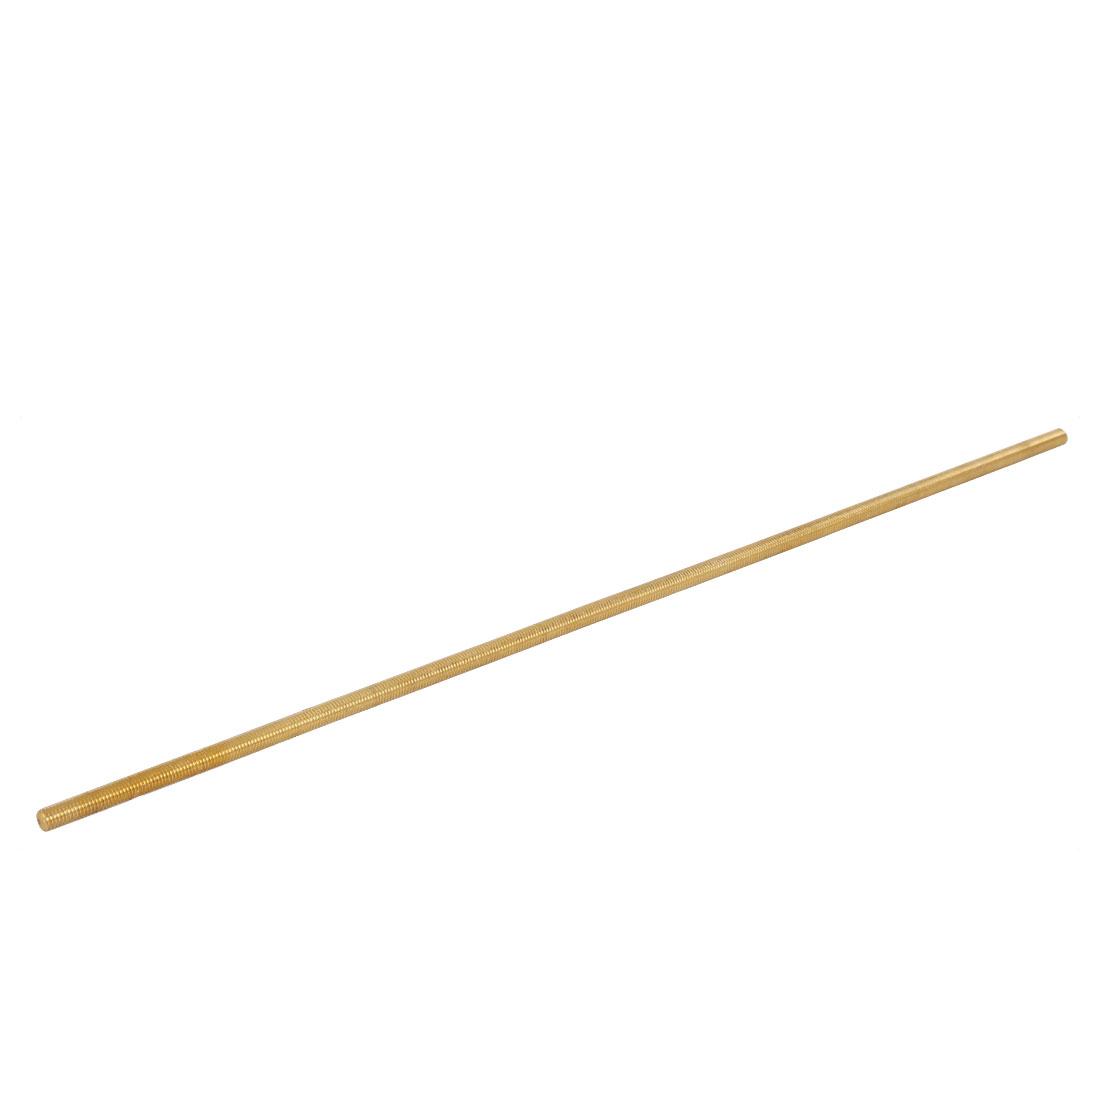 M8 Male Threaded 1.25mm Pitch Full Thread Brass Rod Bar Fastener 500mm Length